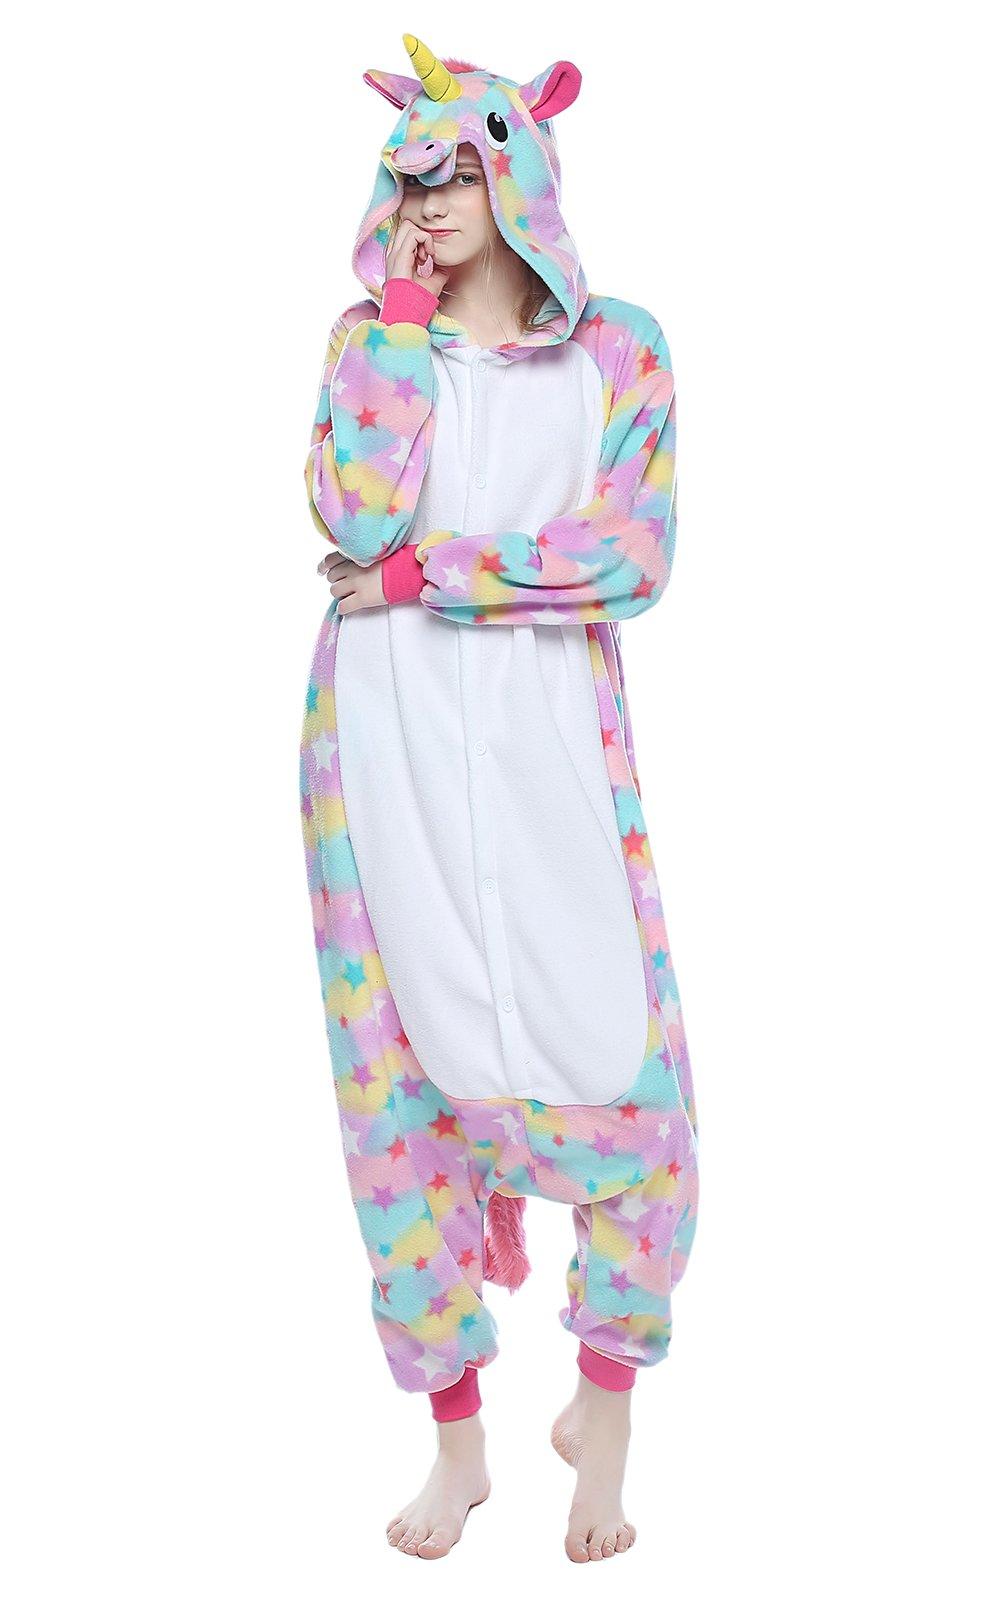 PECHASE Halloween Adult Pajamas Sleepwear Animal Cosplay Costume (M, Star Unicorn)